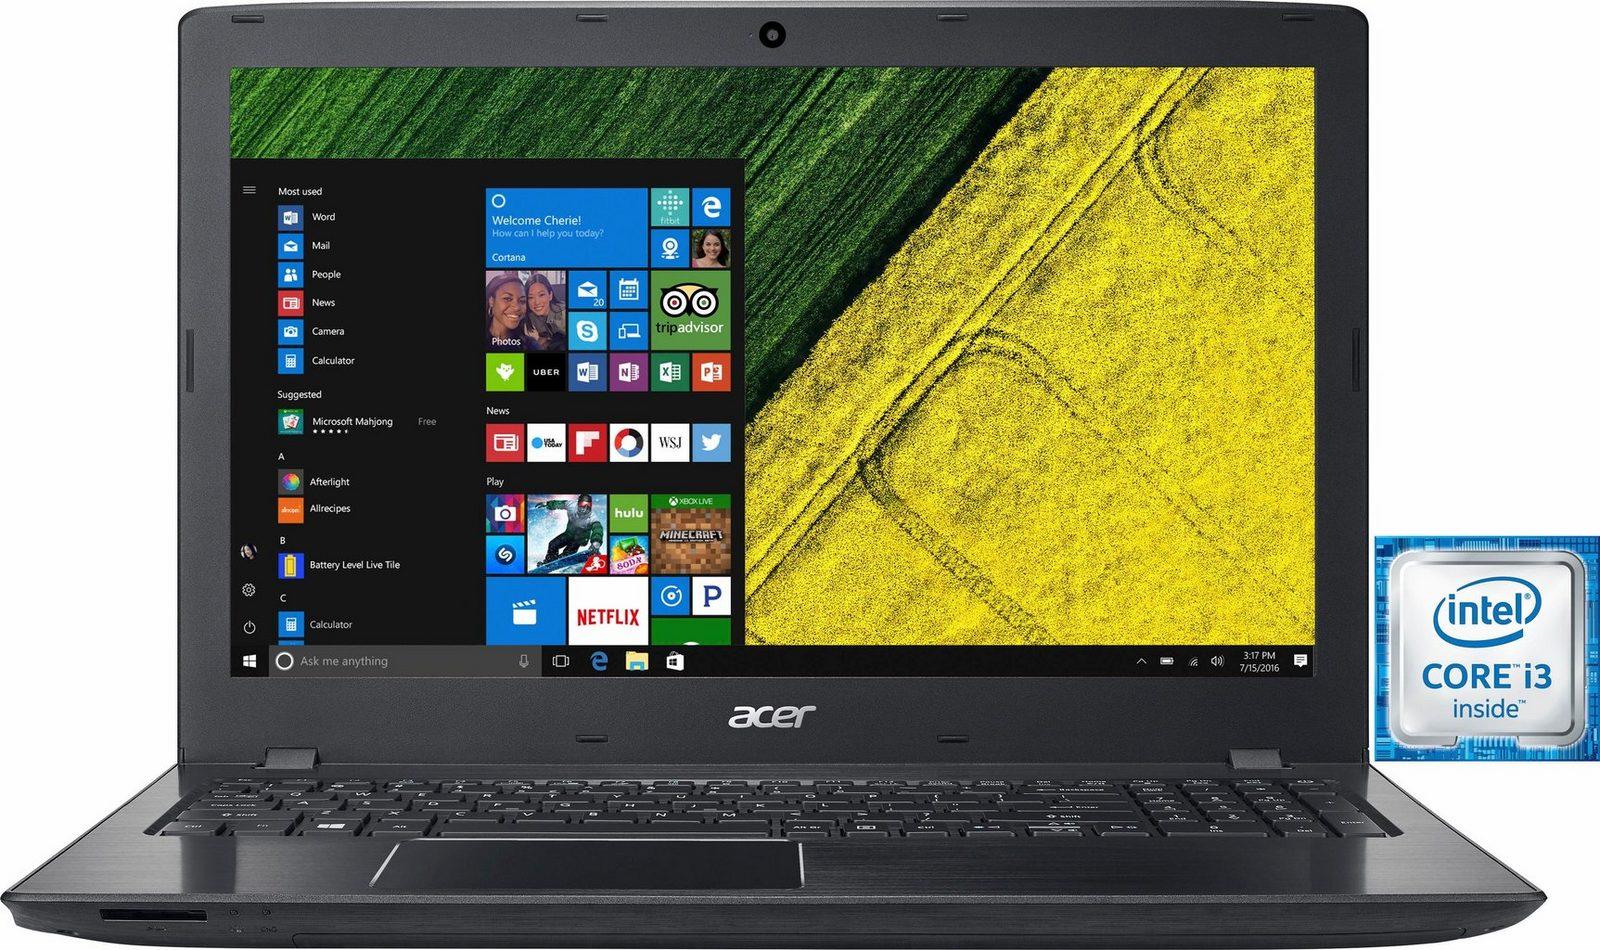 Acer Aspire E5-575G-35RS Notebook, Intel Core i3, 39,6 cm (15,6 Zoll), 1000 GB Speicher